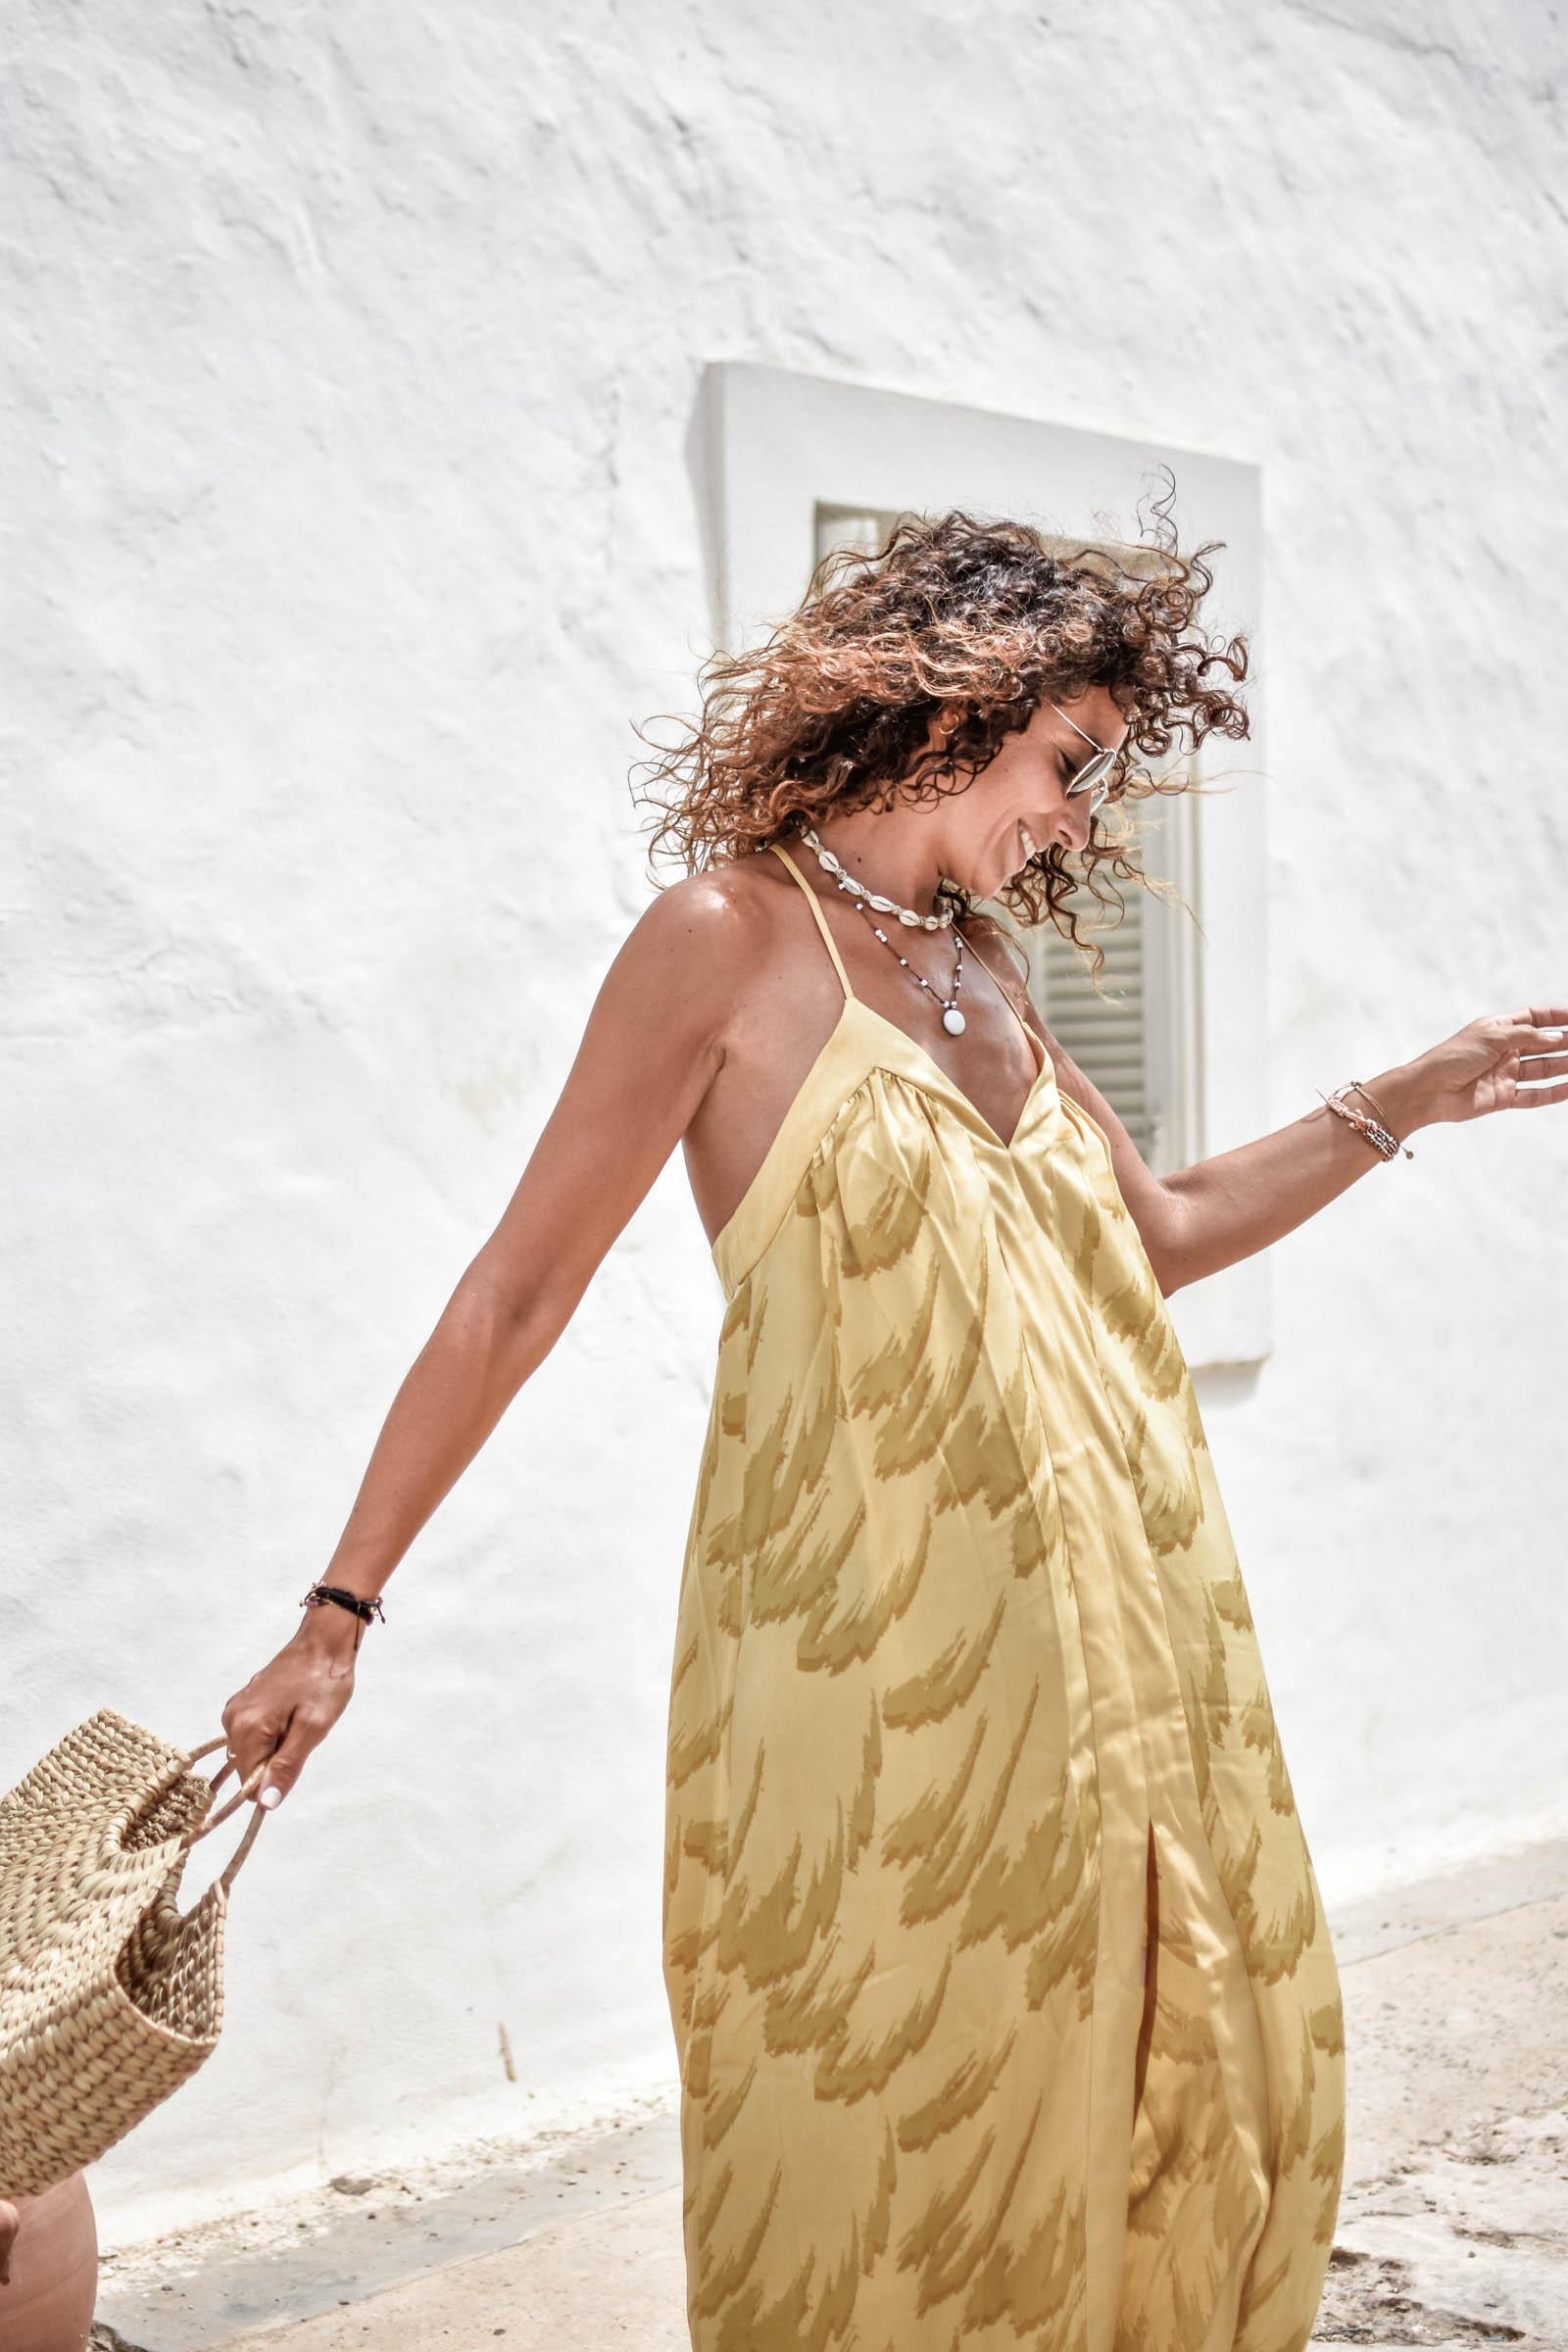 el-blog-de-silvia-rodriguez-lifestyle-travel-blogger-verano-vacaciones-en-Formentera-donde-comer-revolve-maxi-dress-holidays